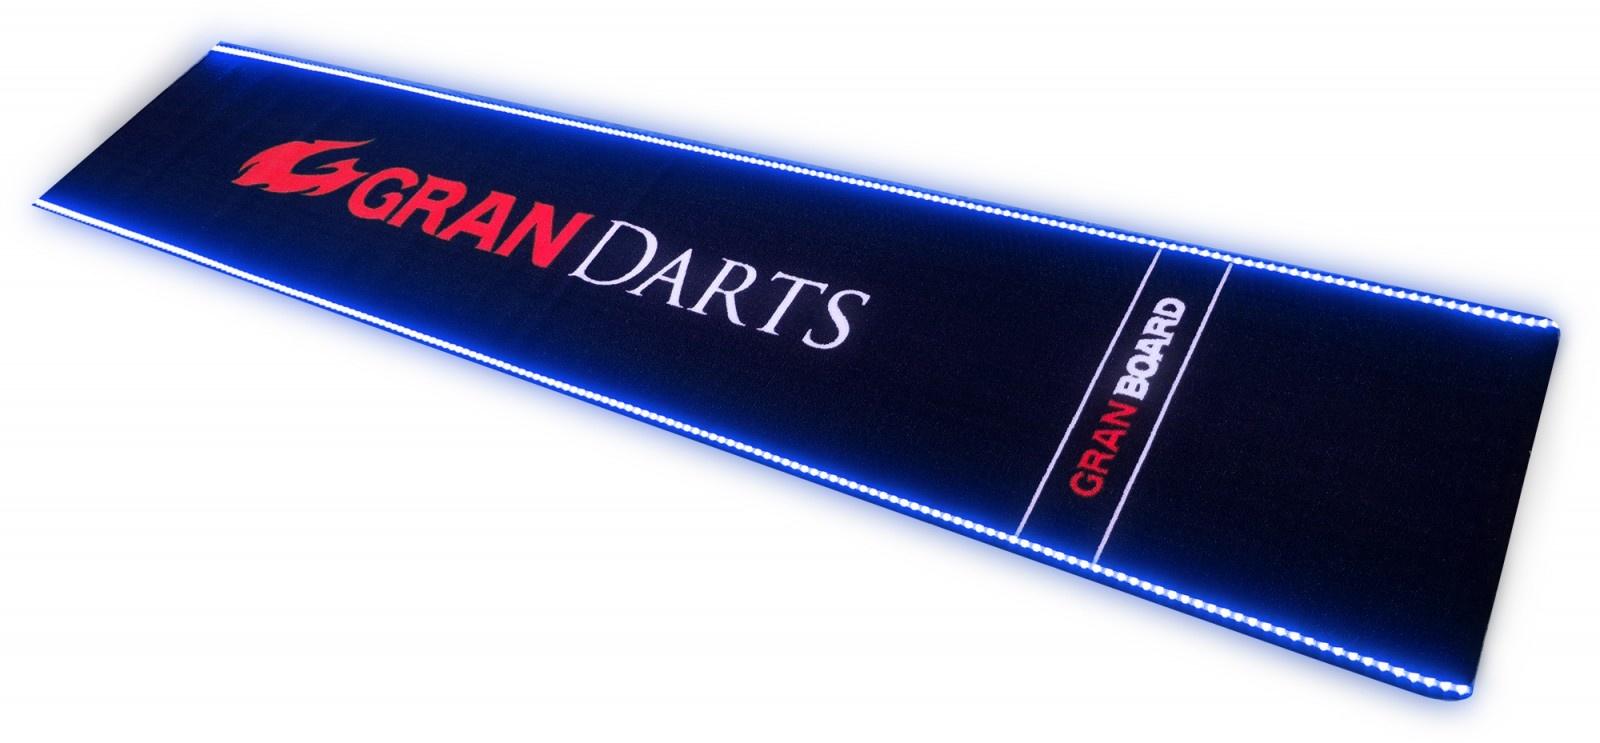 GranBoard LED Darts Mat